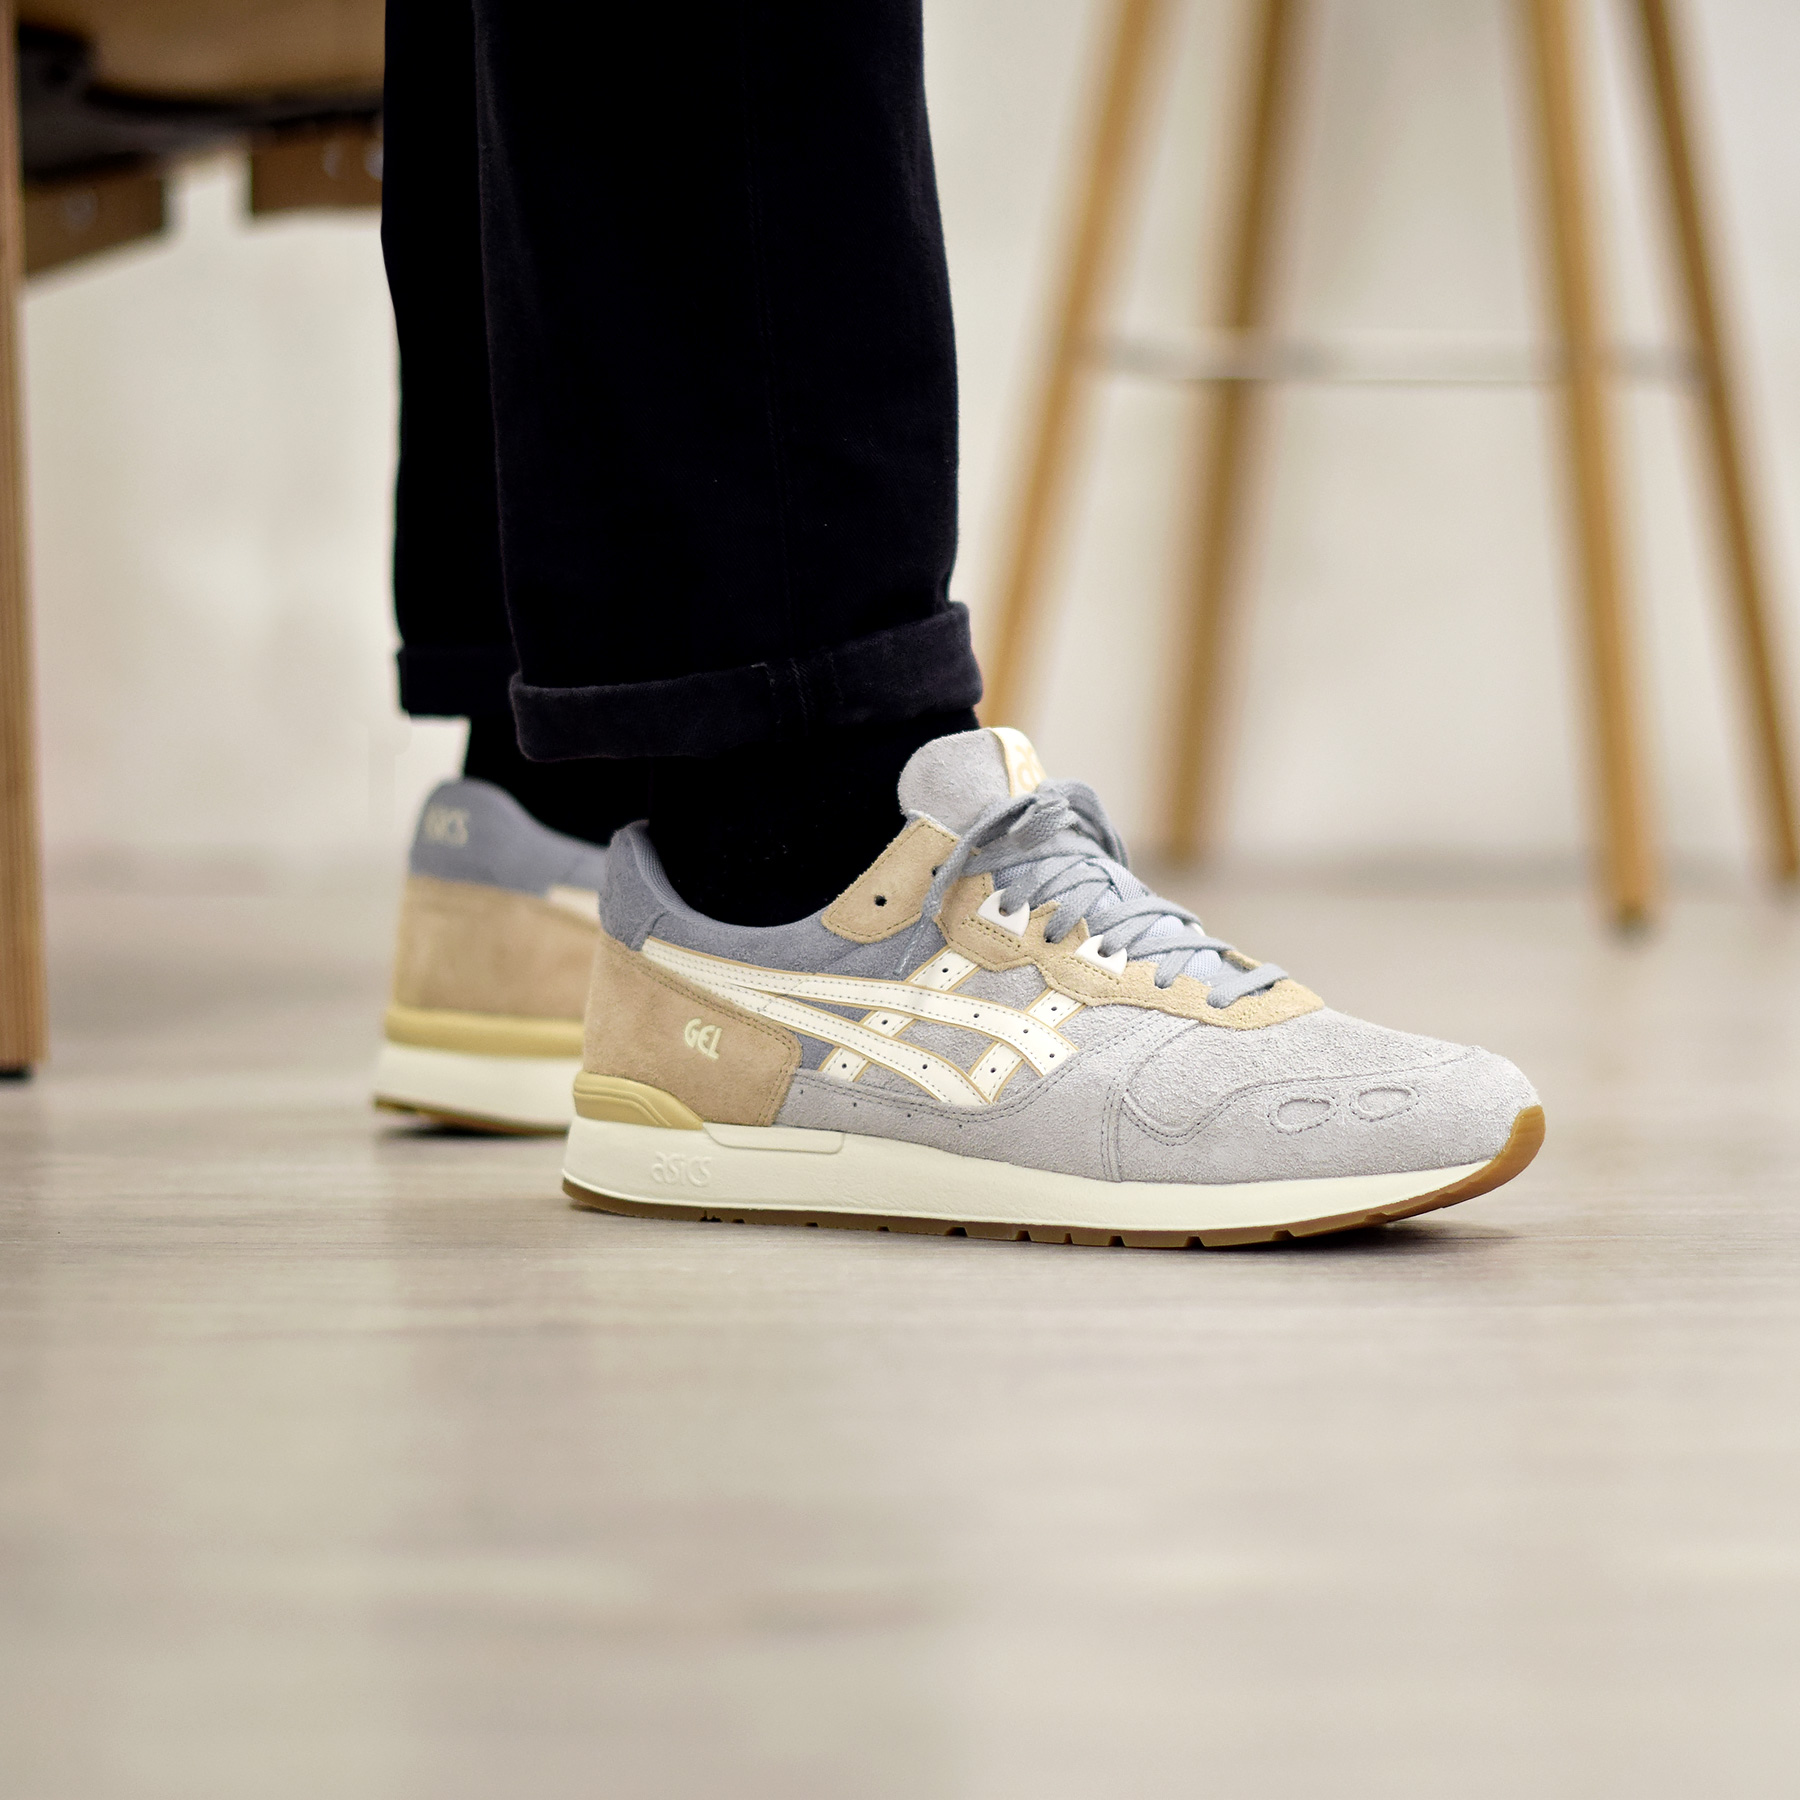 design de qualité 134f1 83c77 Asics Gel Lyte Glacier Grey Cream Pack - Sneakers.fr